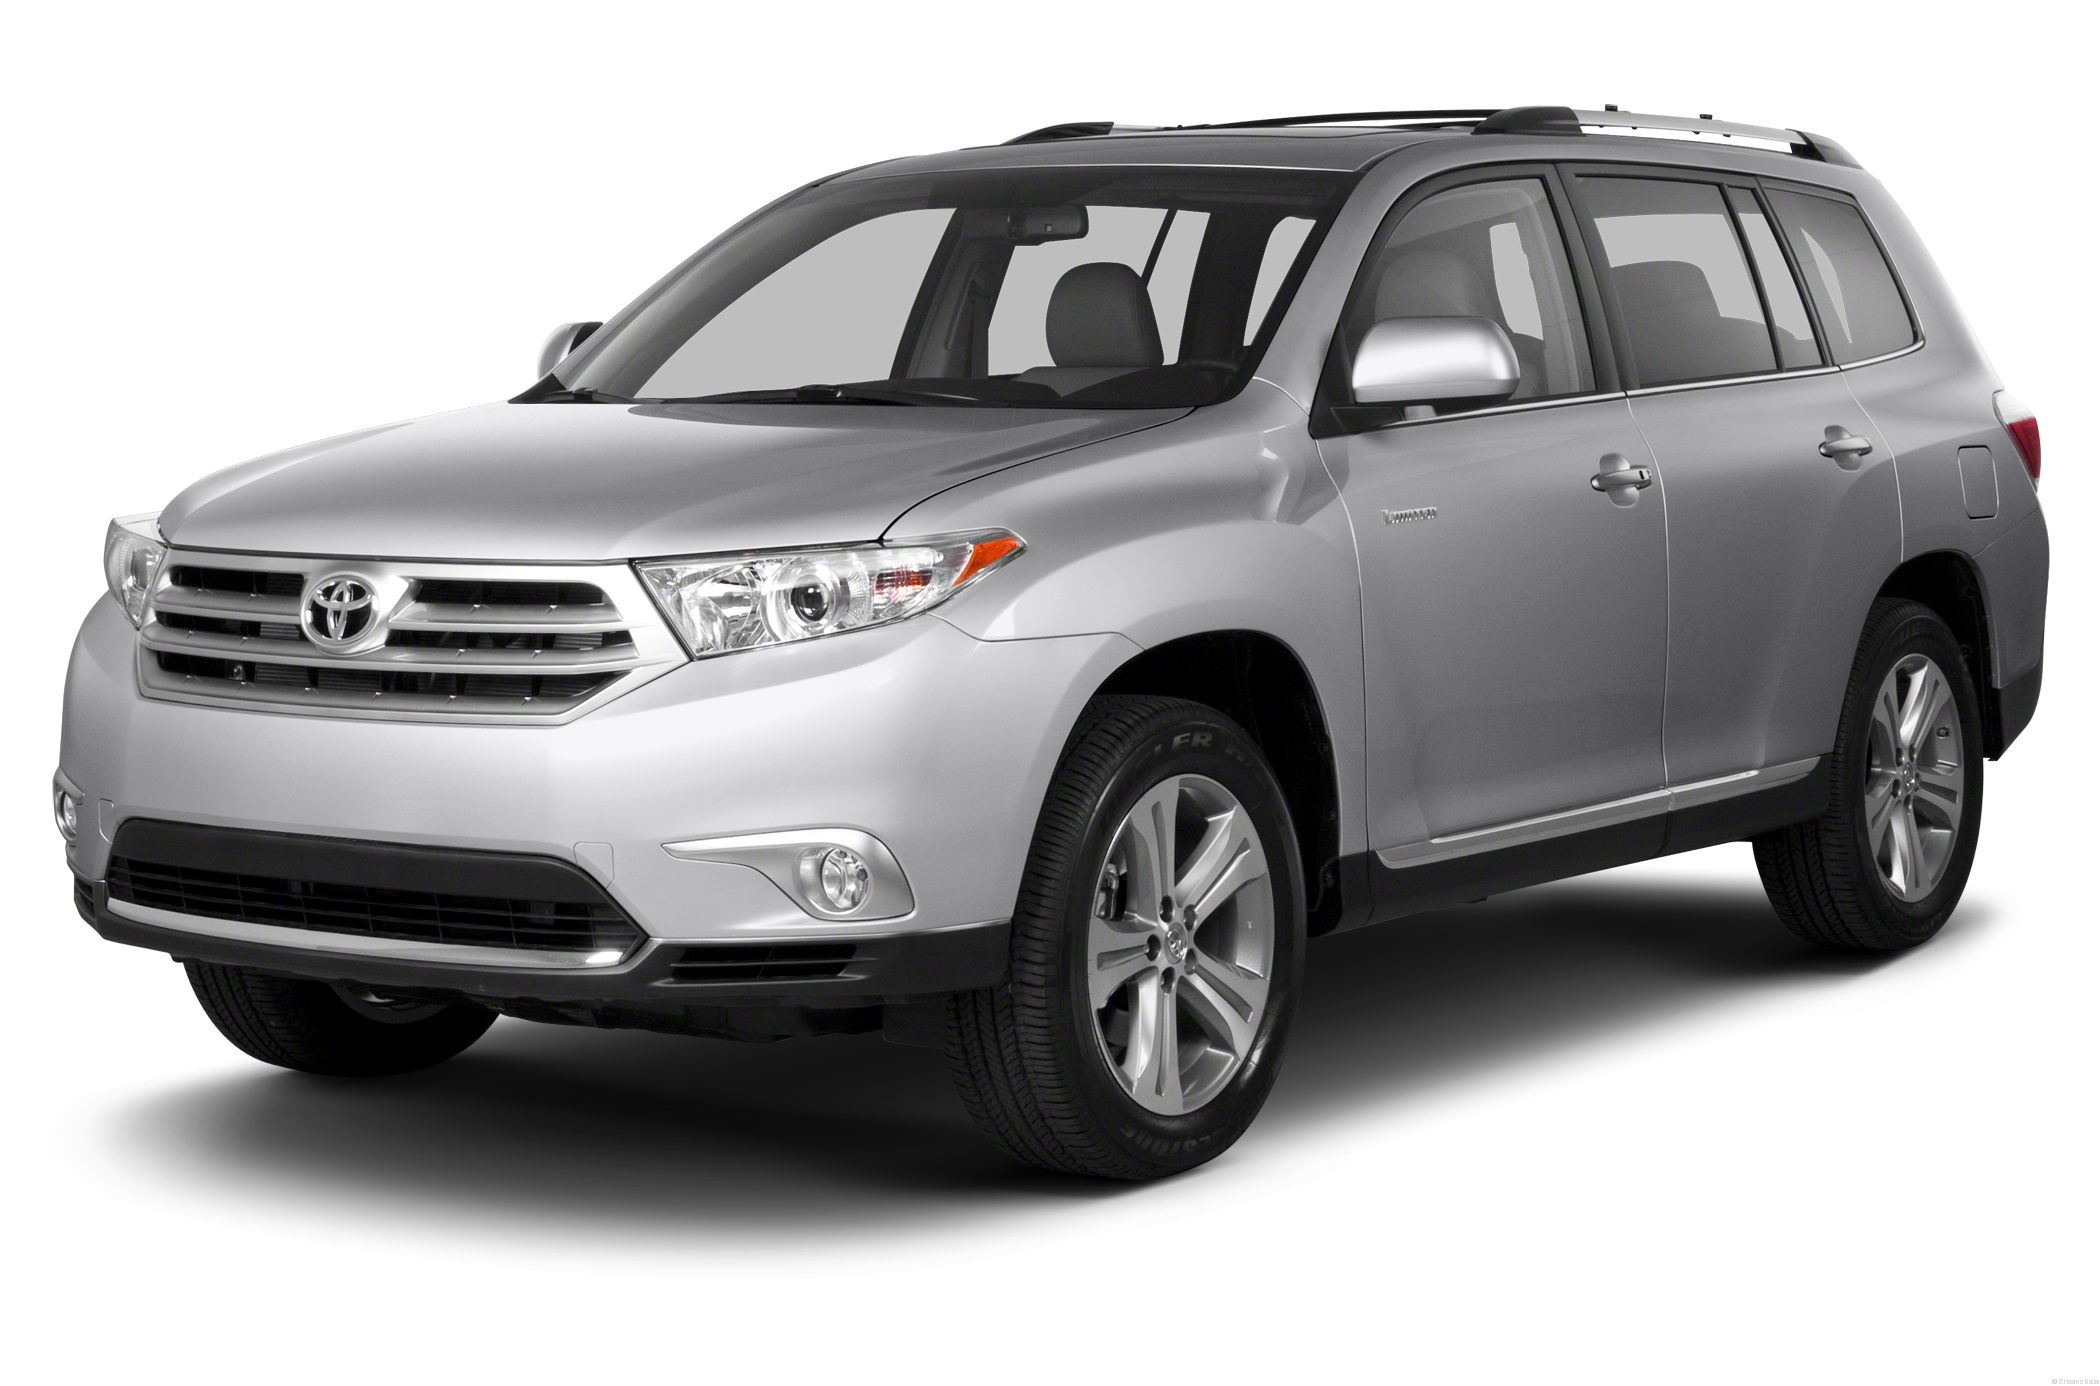 2014 Tax Credit On Highlander Autos Post